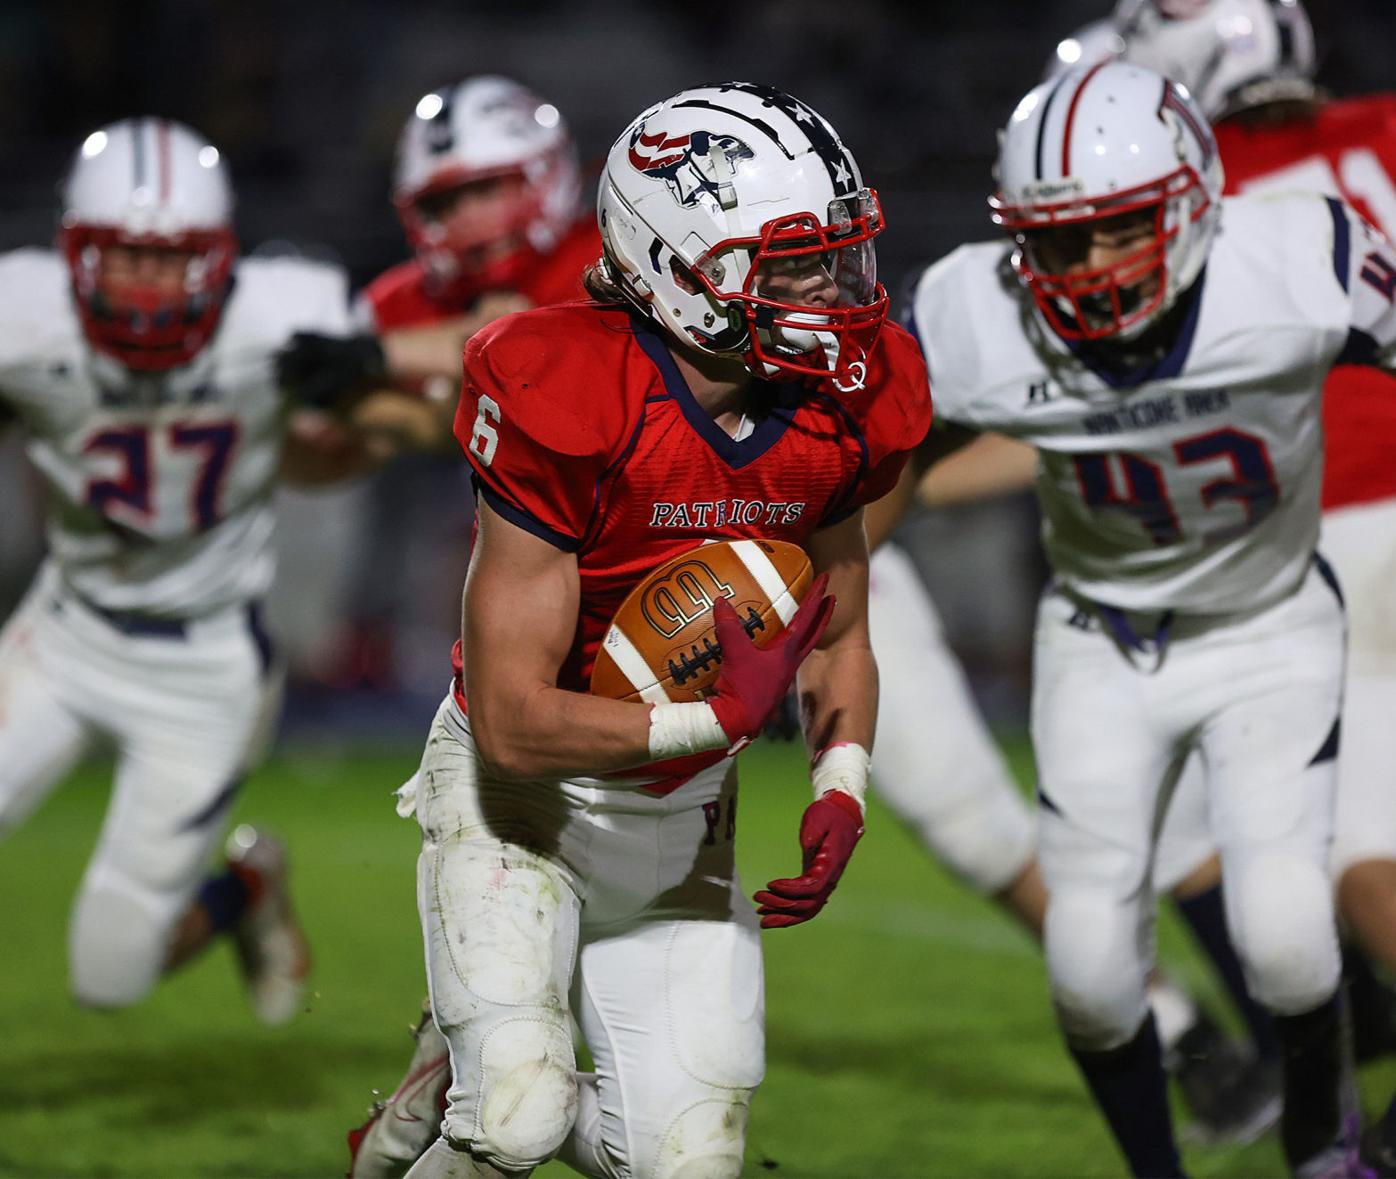 High School Football: Pittston Area vs Nanticoke Area